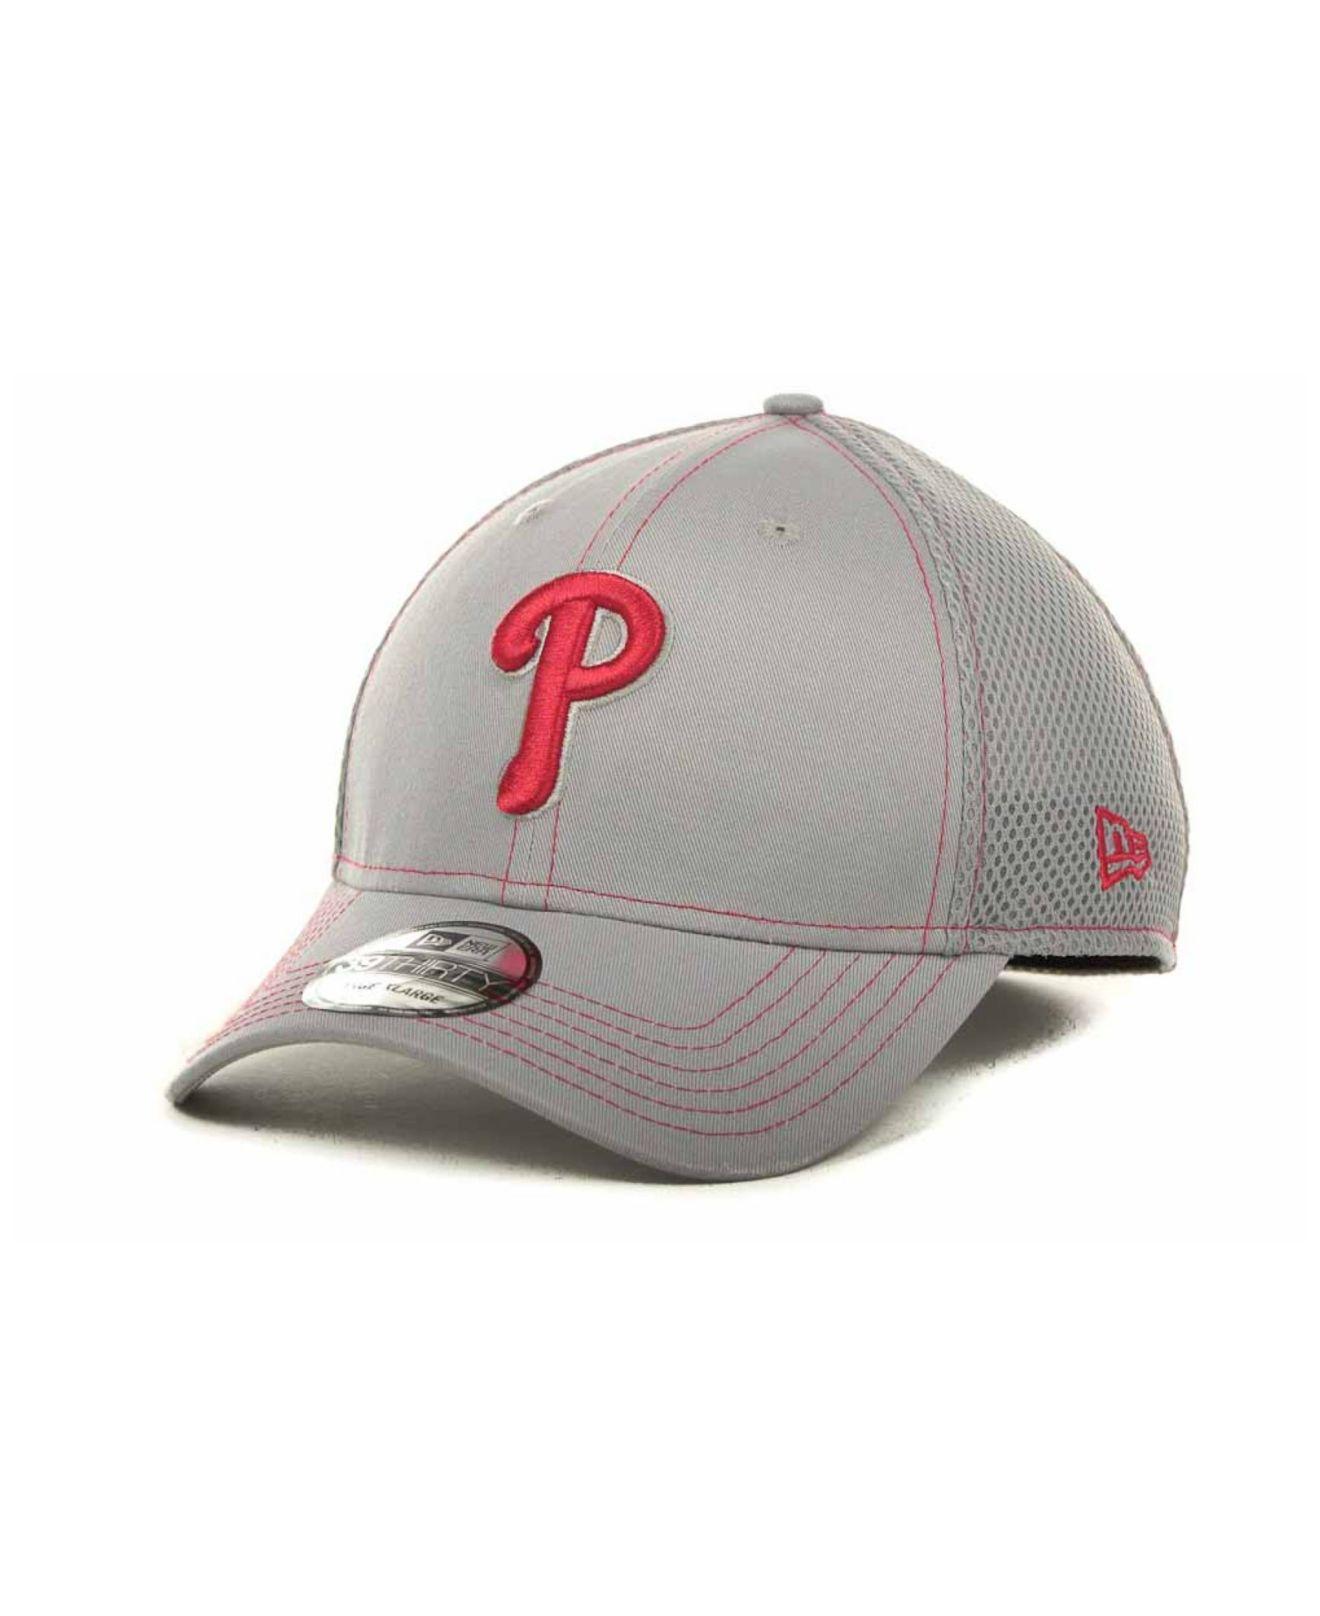 reputable site 95352 0f641 KTZ Philadelphia Phillies Gray Neo 39thirty Cap in Gray for Men - Lyst